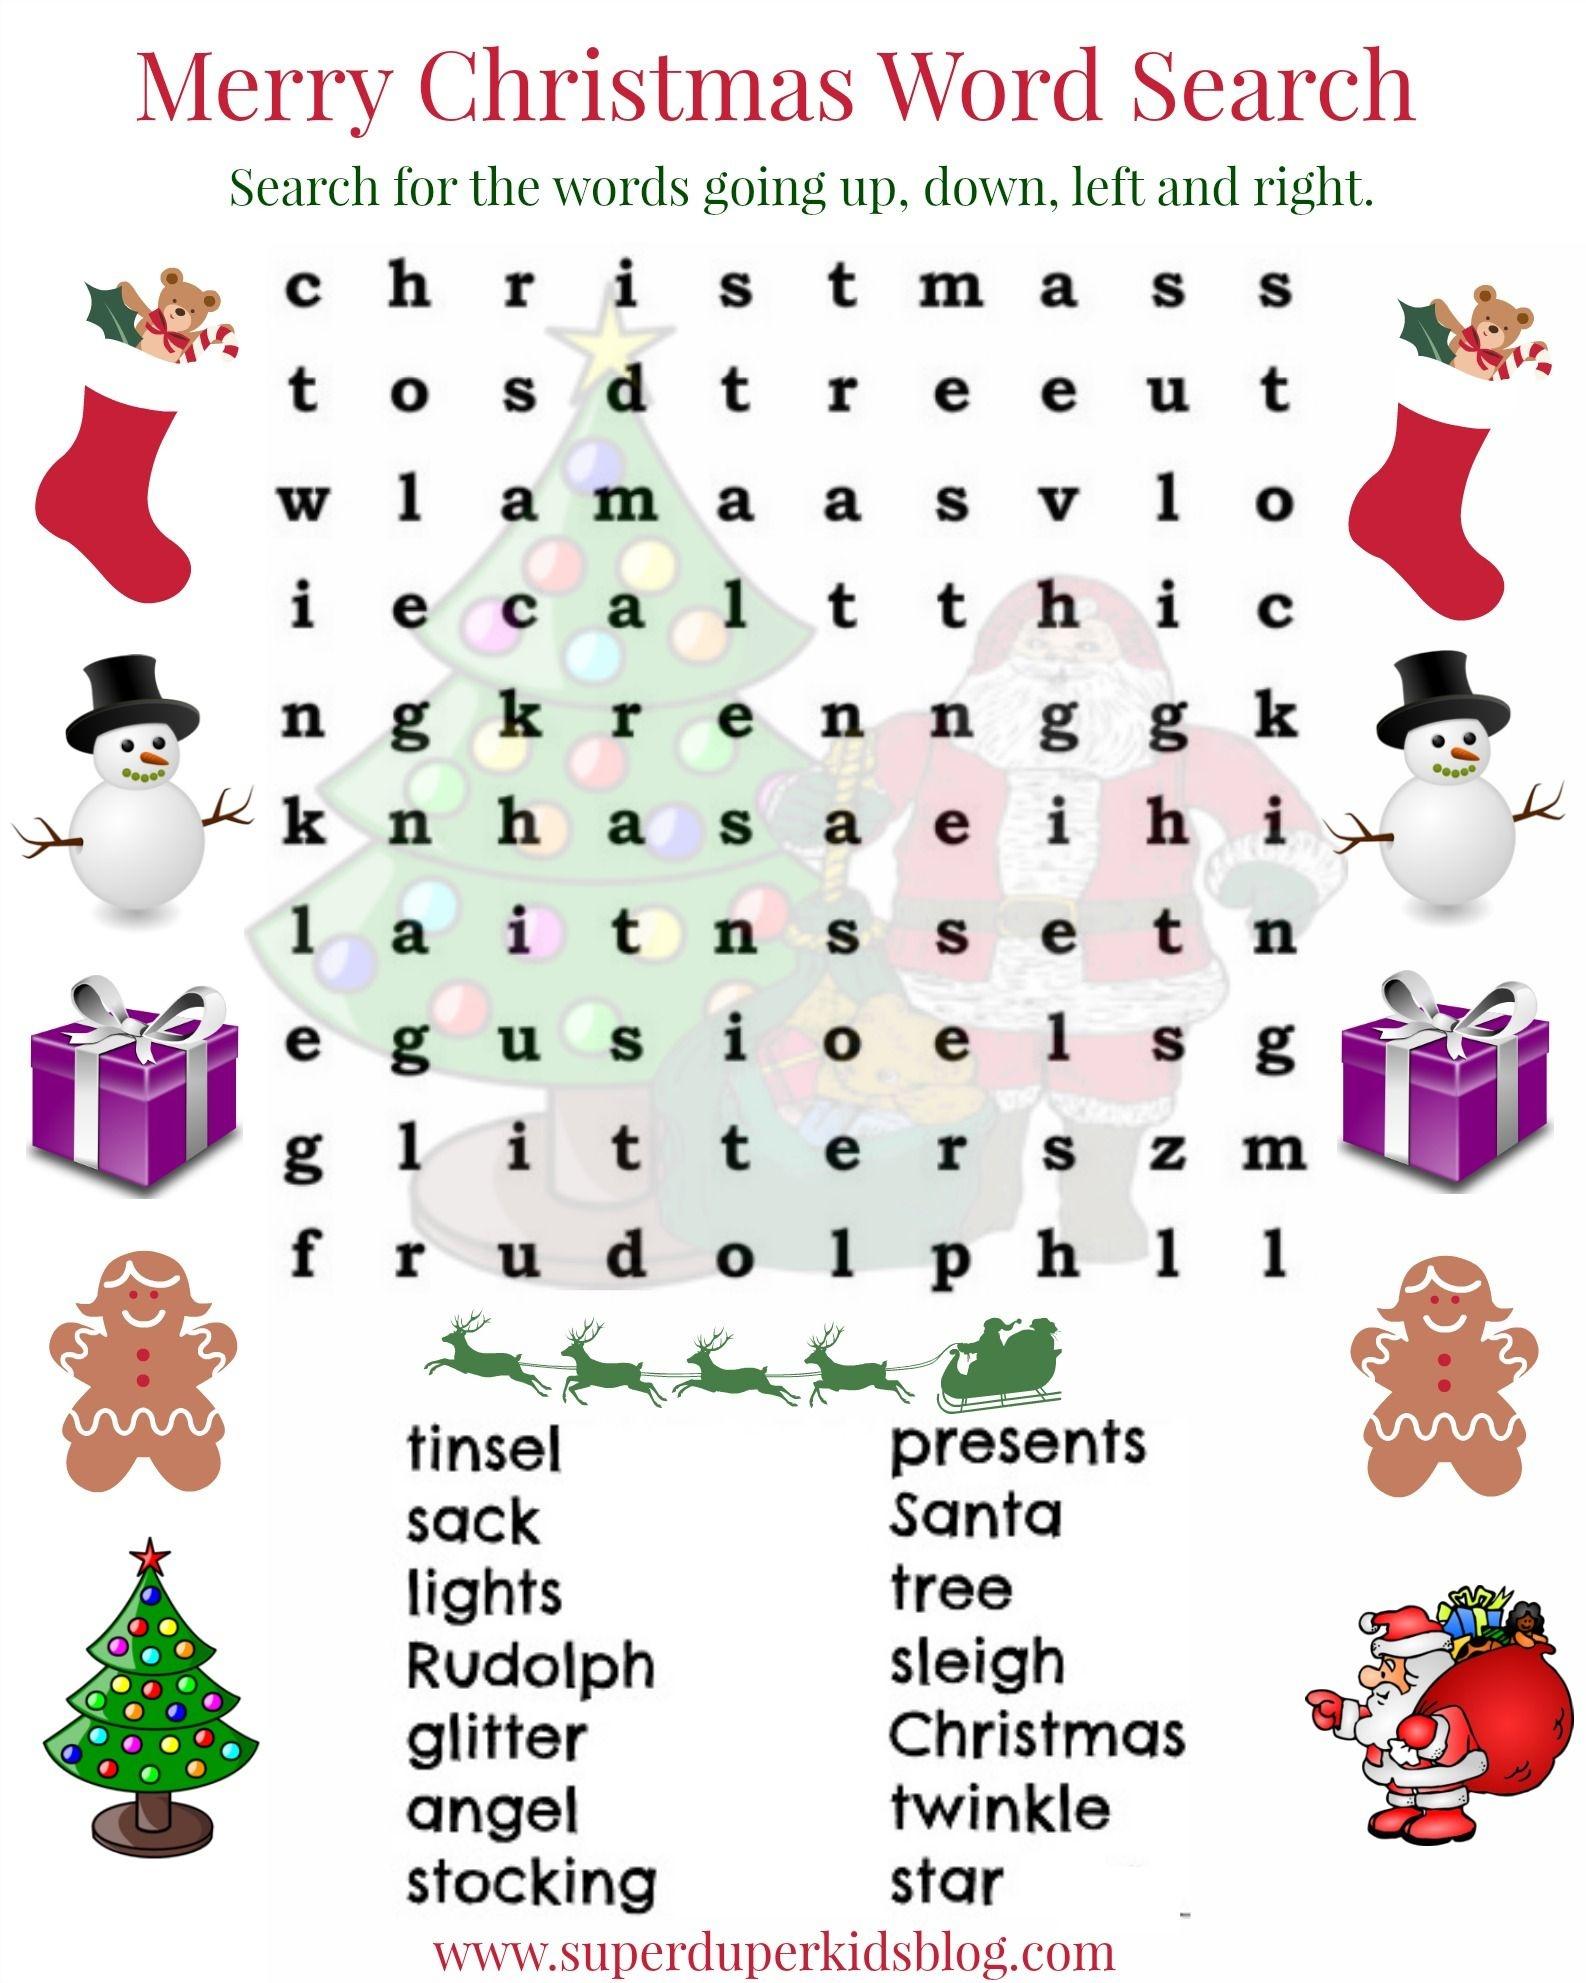 Pinsuperduperkidsblog On Free Printables   Christmas Word Search - Free Printable Christmas Word Search